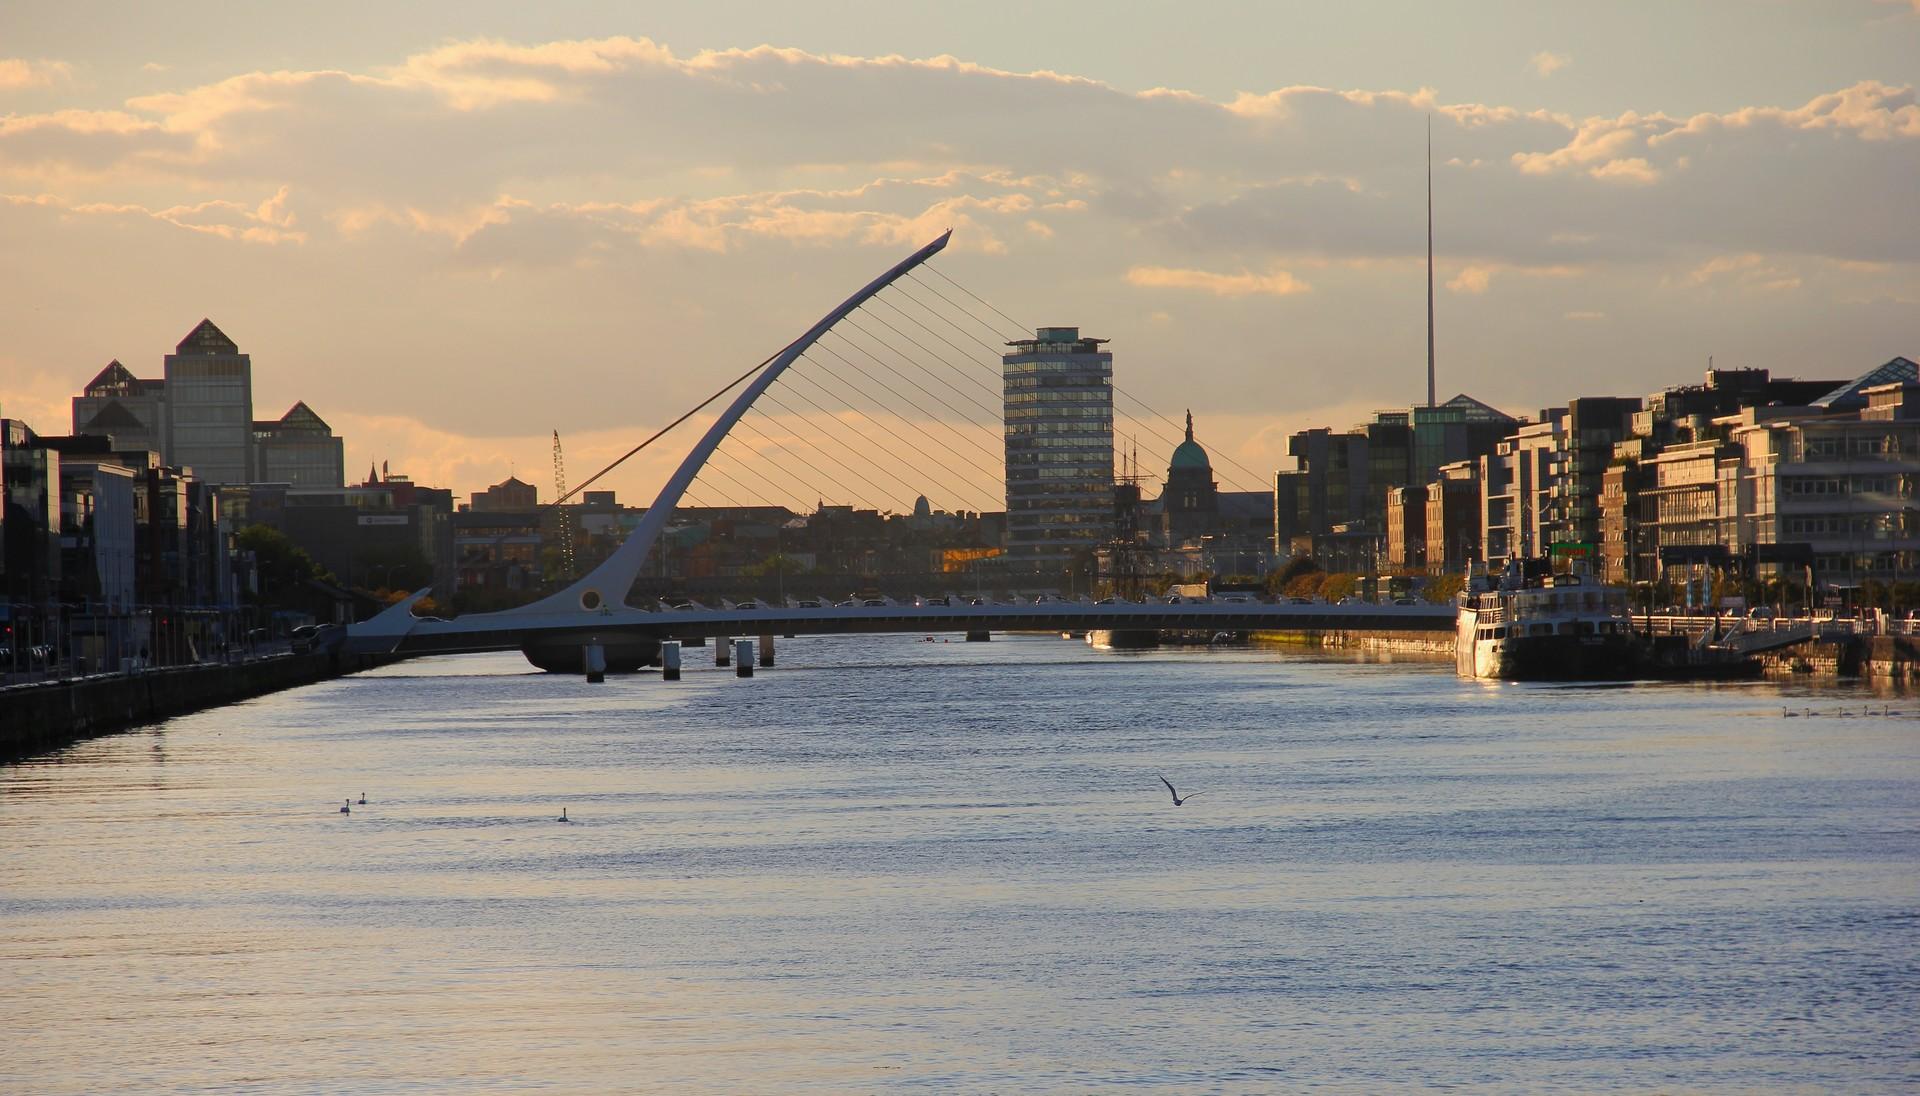 L'esperienza a Dublino (Irlanda) di Lina